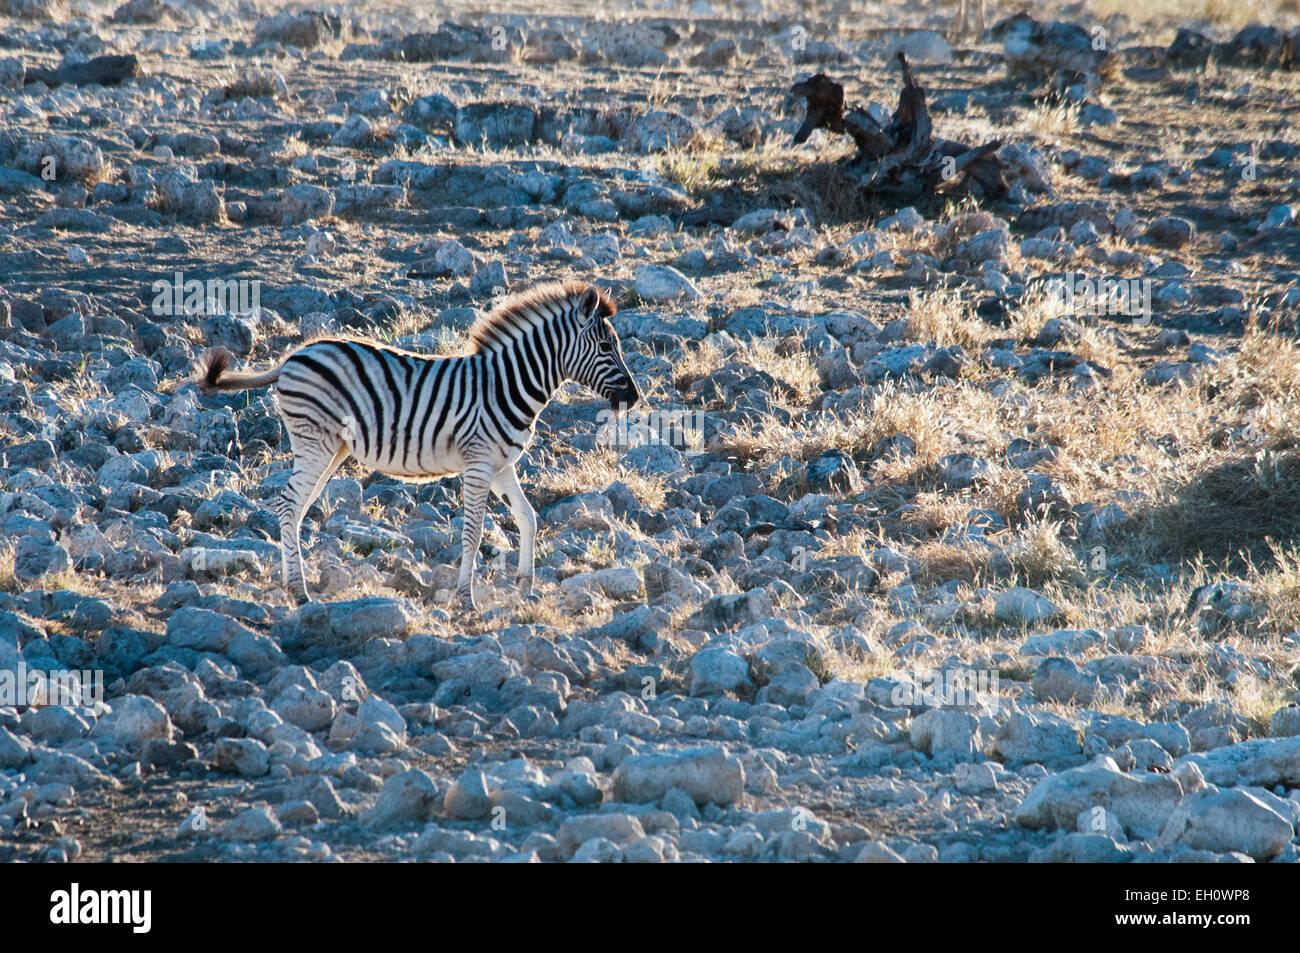 Burchell's Zebra, Equus burchellii, solitary Foal at the Okaukuejo waterhole, Etosha National Park, Namibia, Africa Stock Photo